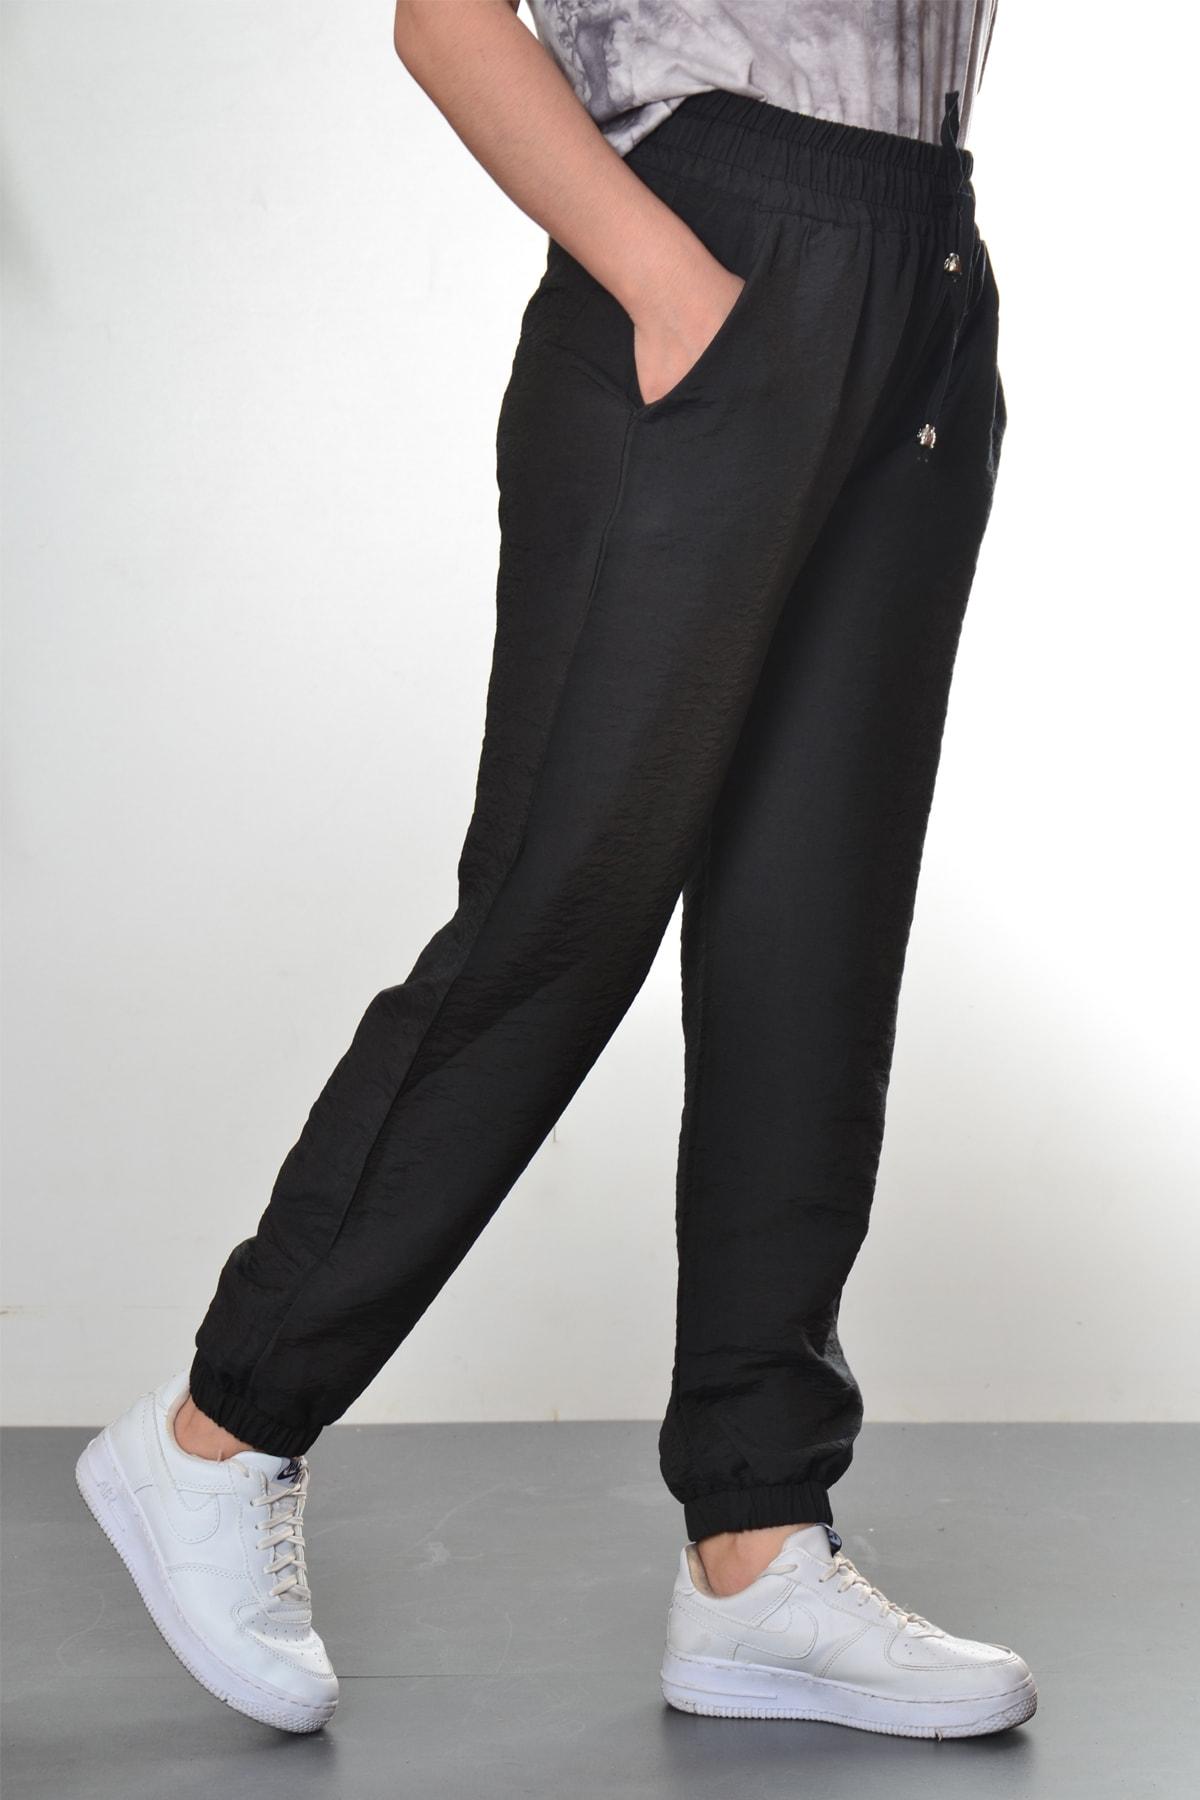 Modayns Kadın Siyah Manşet Ve Cep Detaylı Pantolon 2